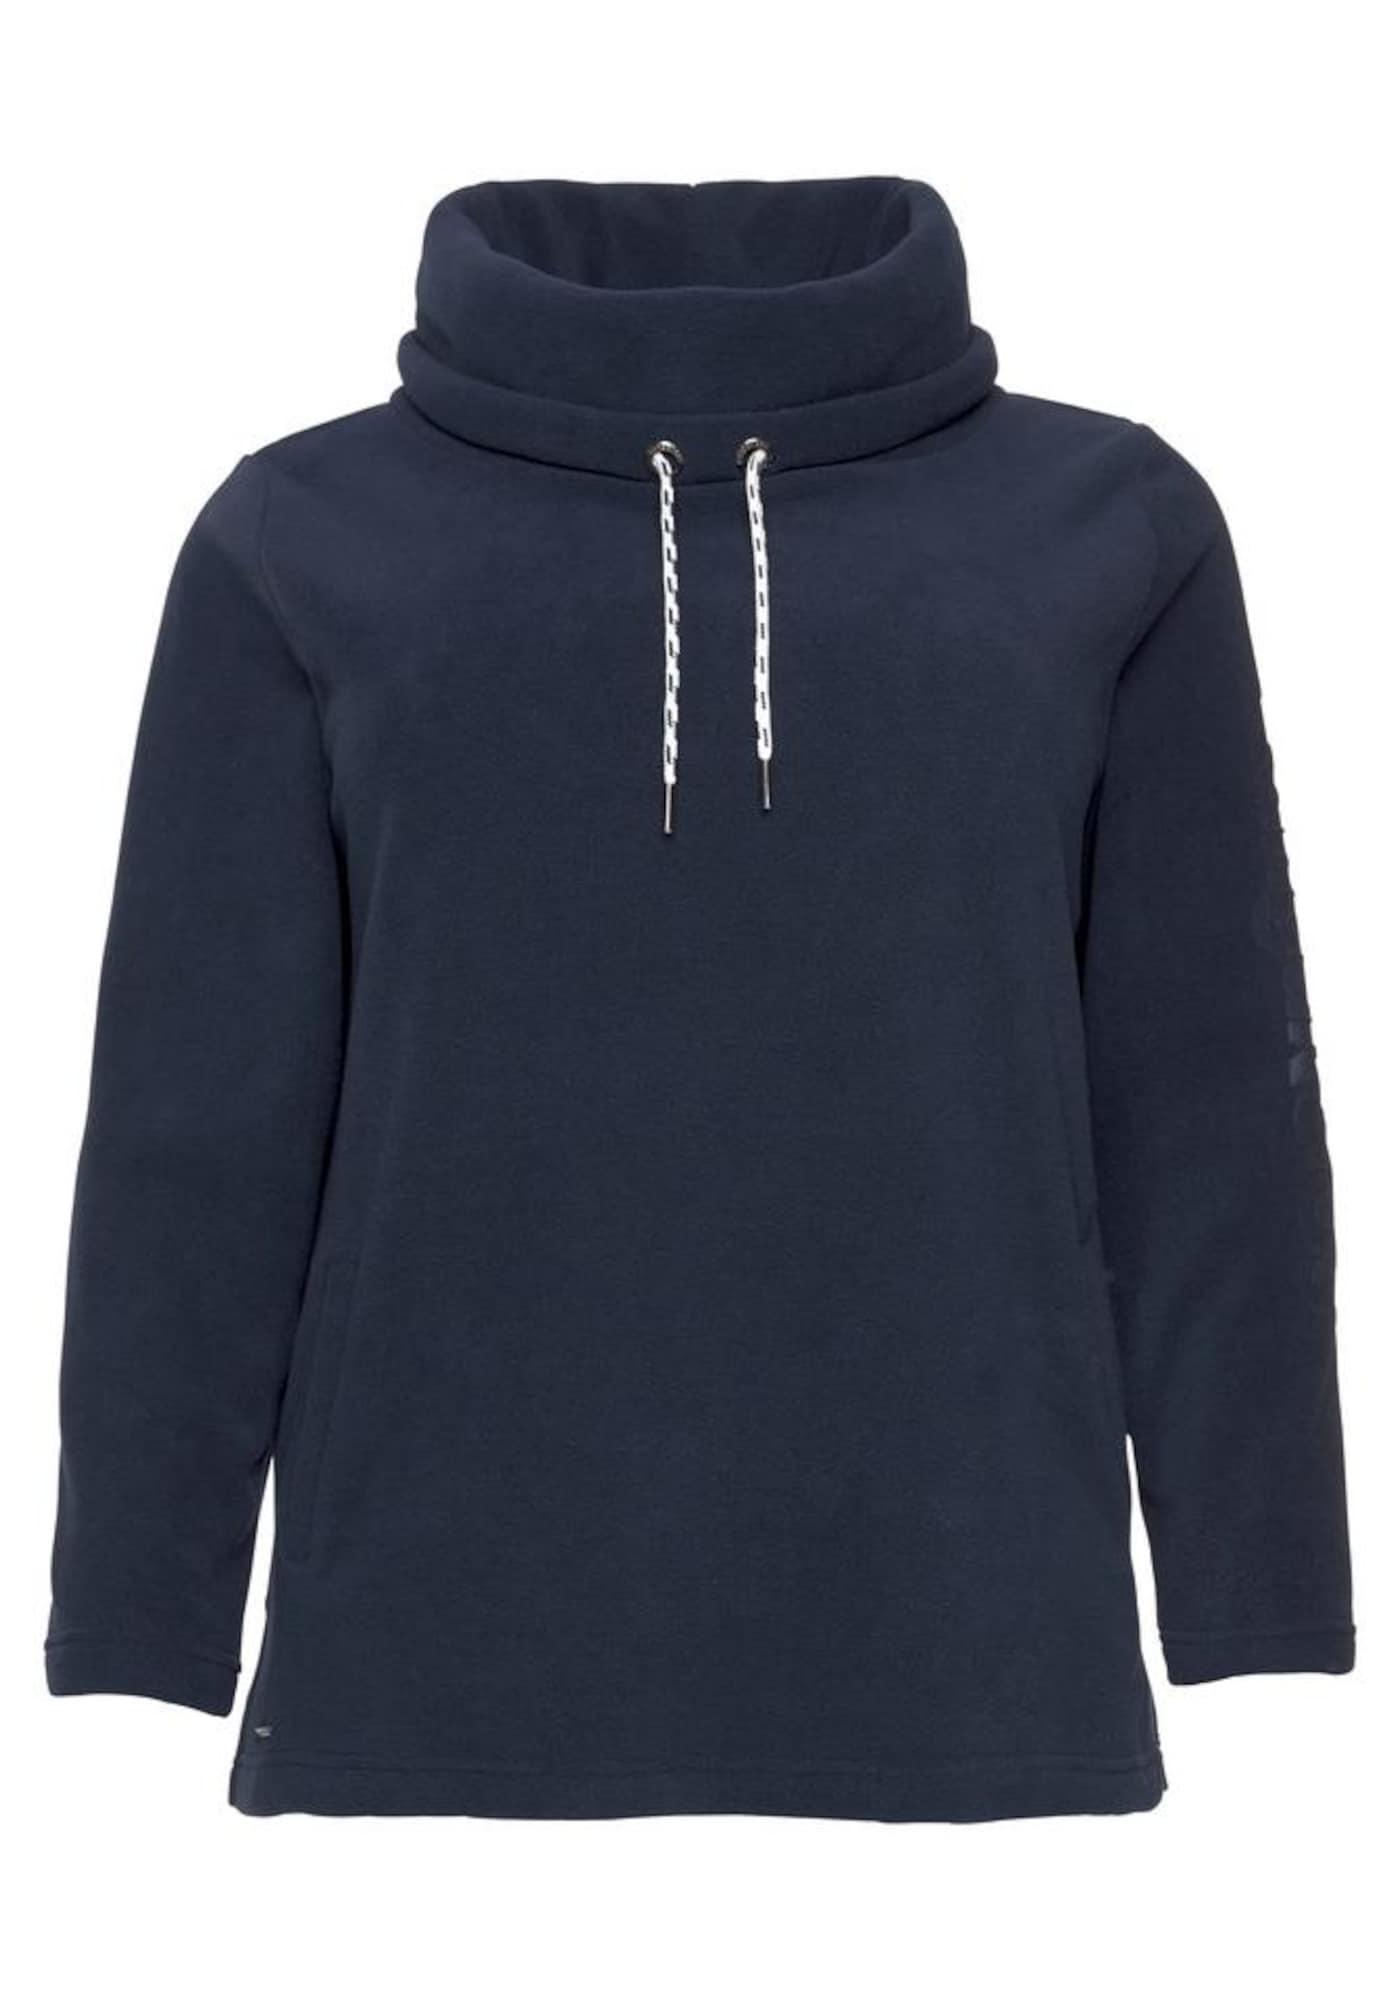 Fleeceshirt   Bekleidung > Sweatshirts & -jacken > Fleeceshirts   Kangaroos